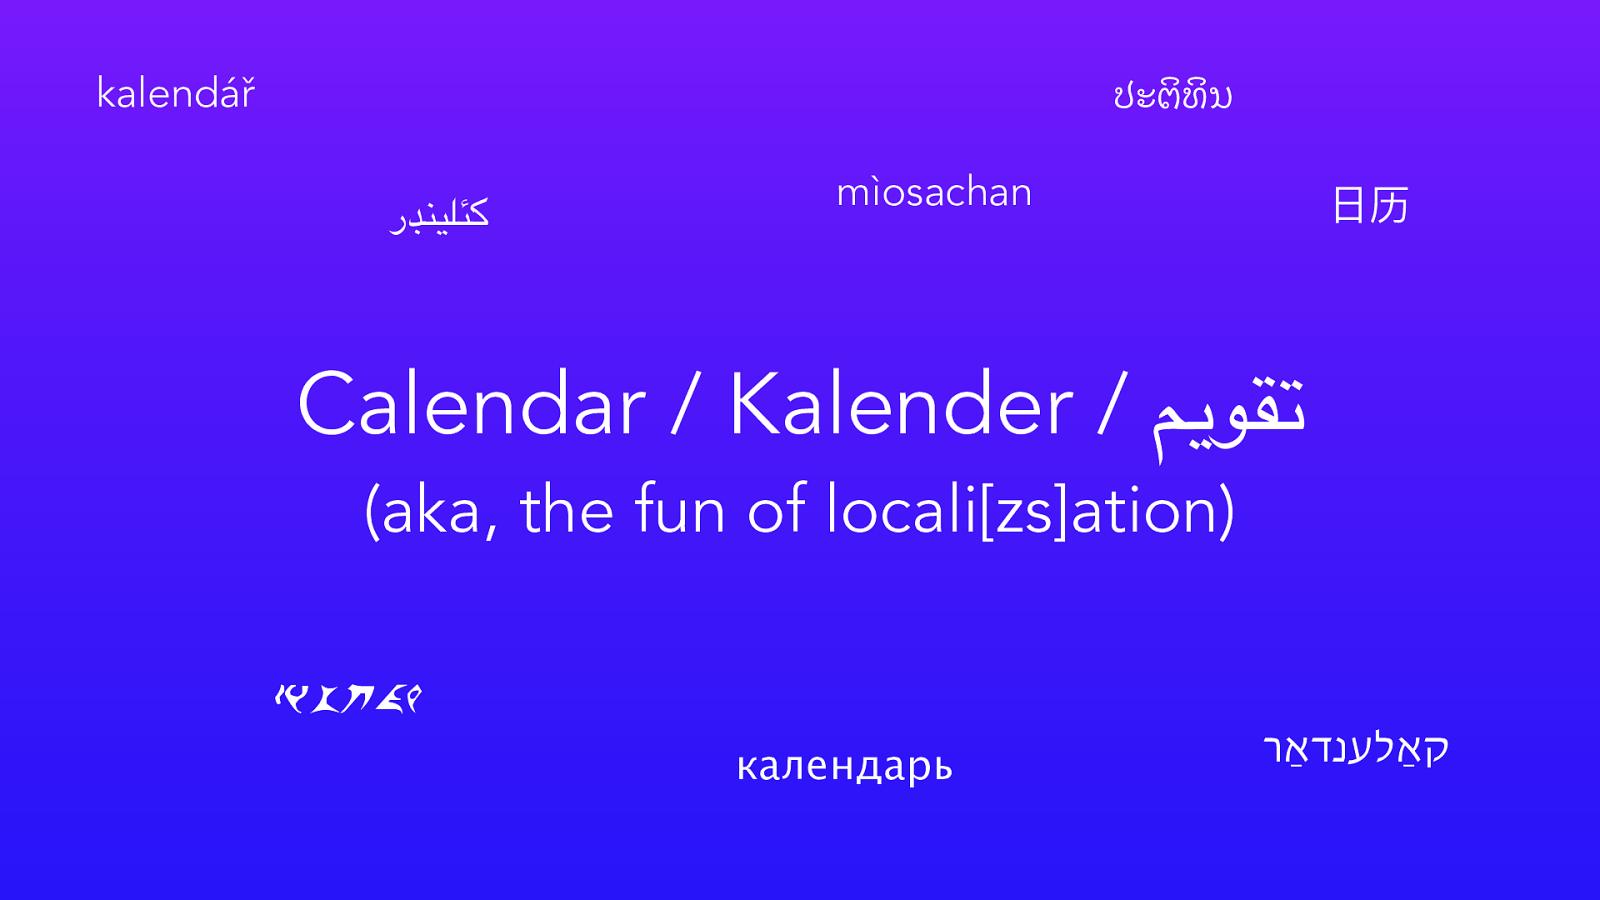 Calendar / Kalender / تقويم (aka, the fun of locali[zs]ation)